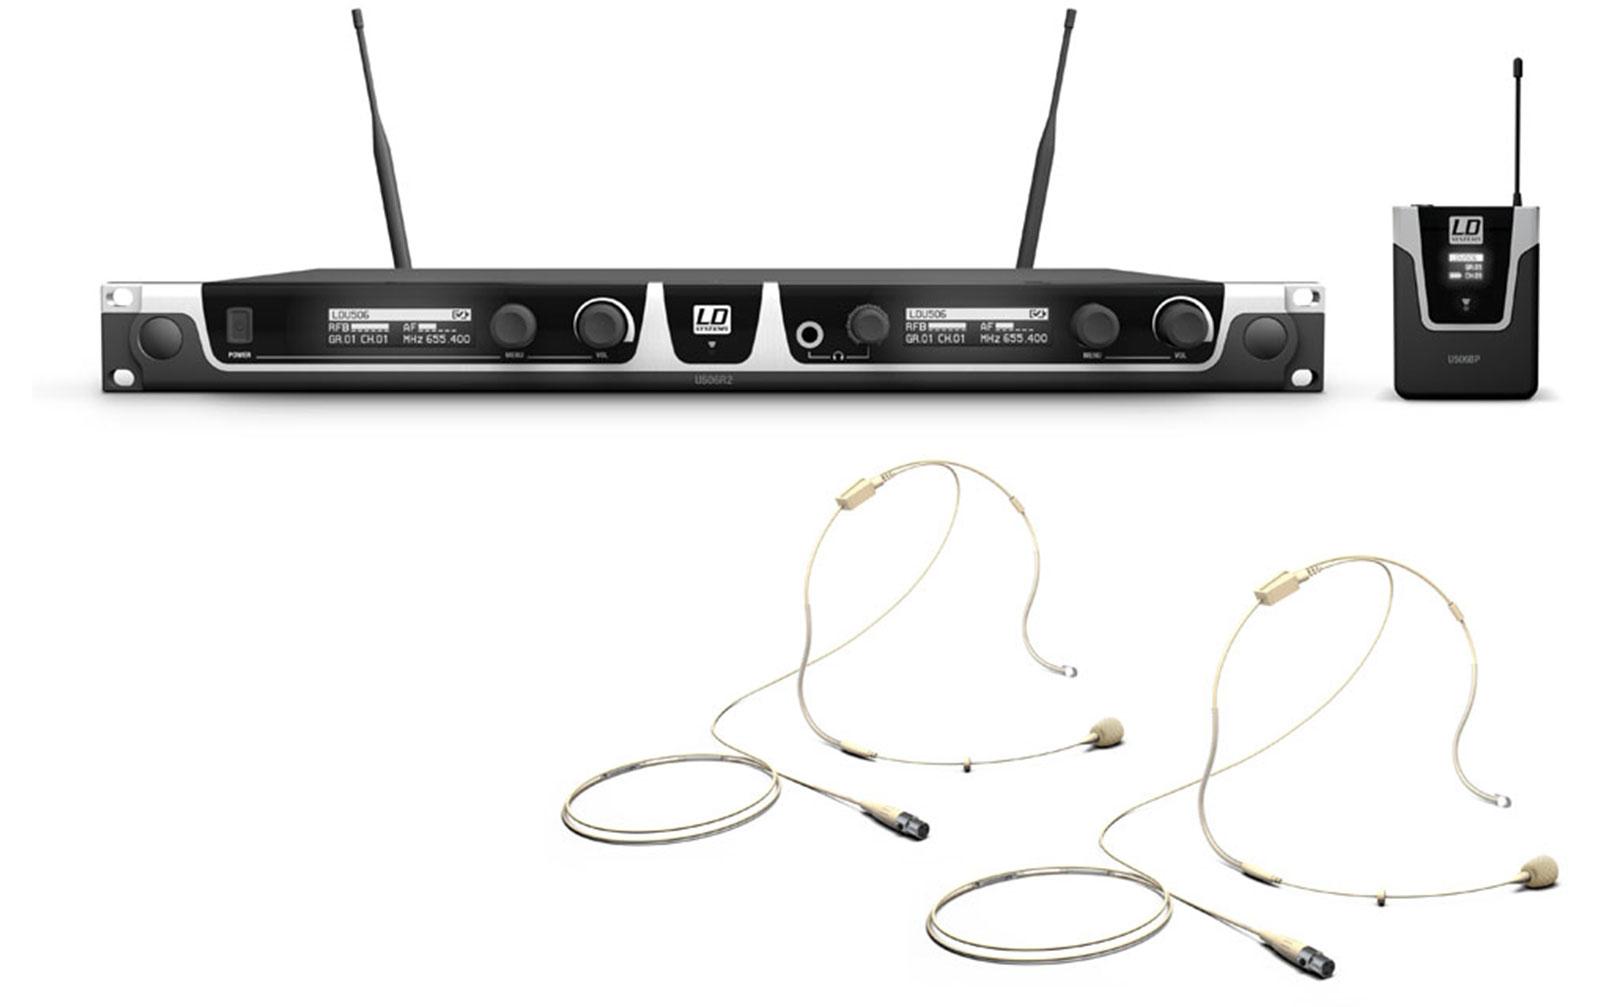 ld-systems-u506-bphh-2-funkmikrofon-system-mit-2-x-bodypack-und-2-x-headset-beigefarben